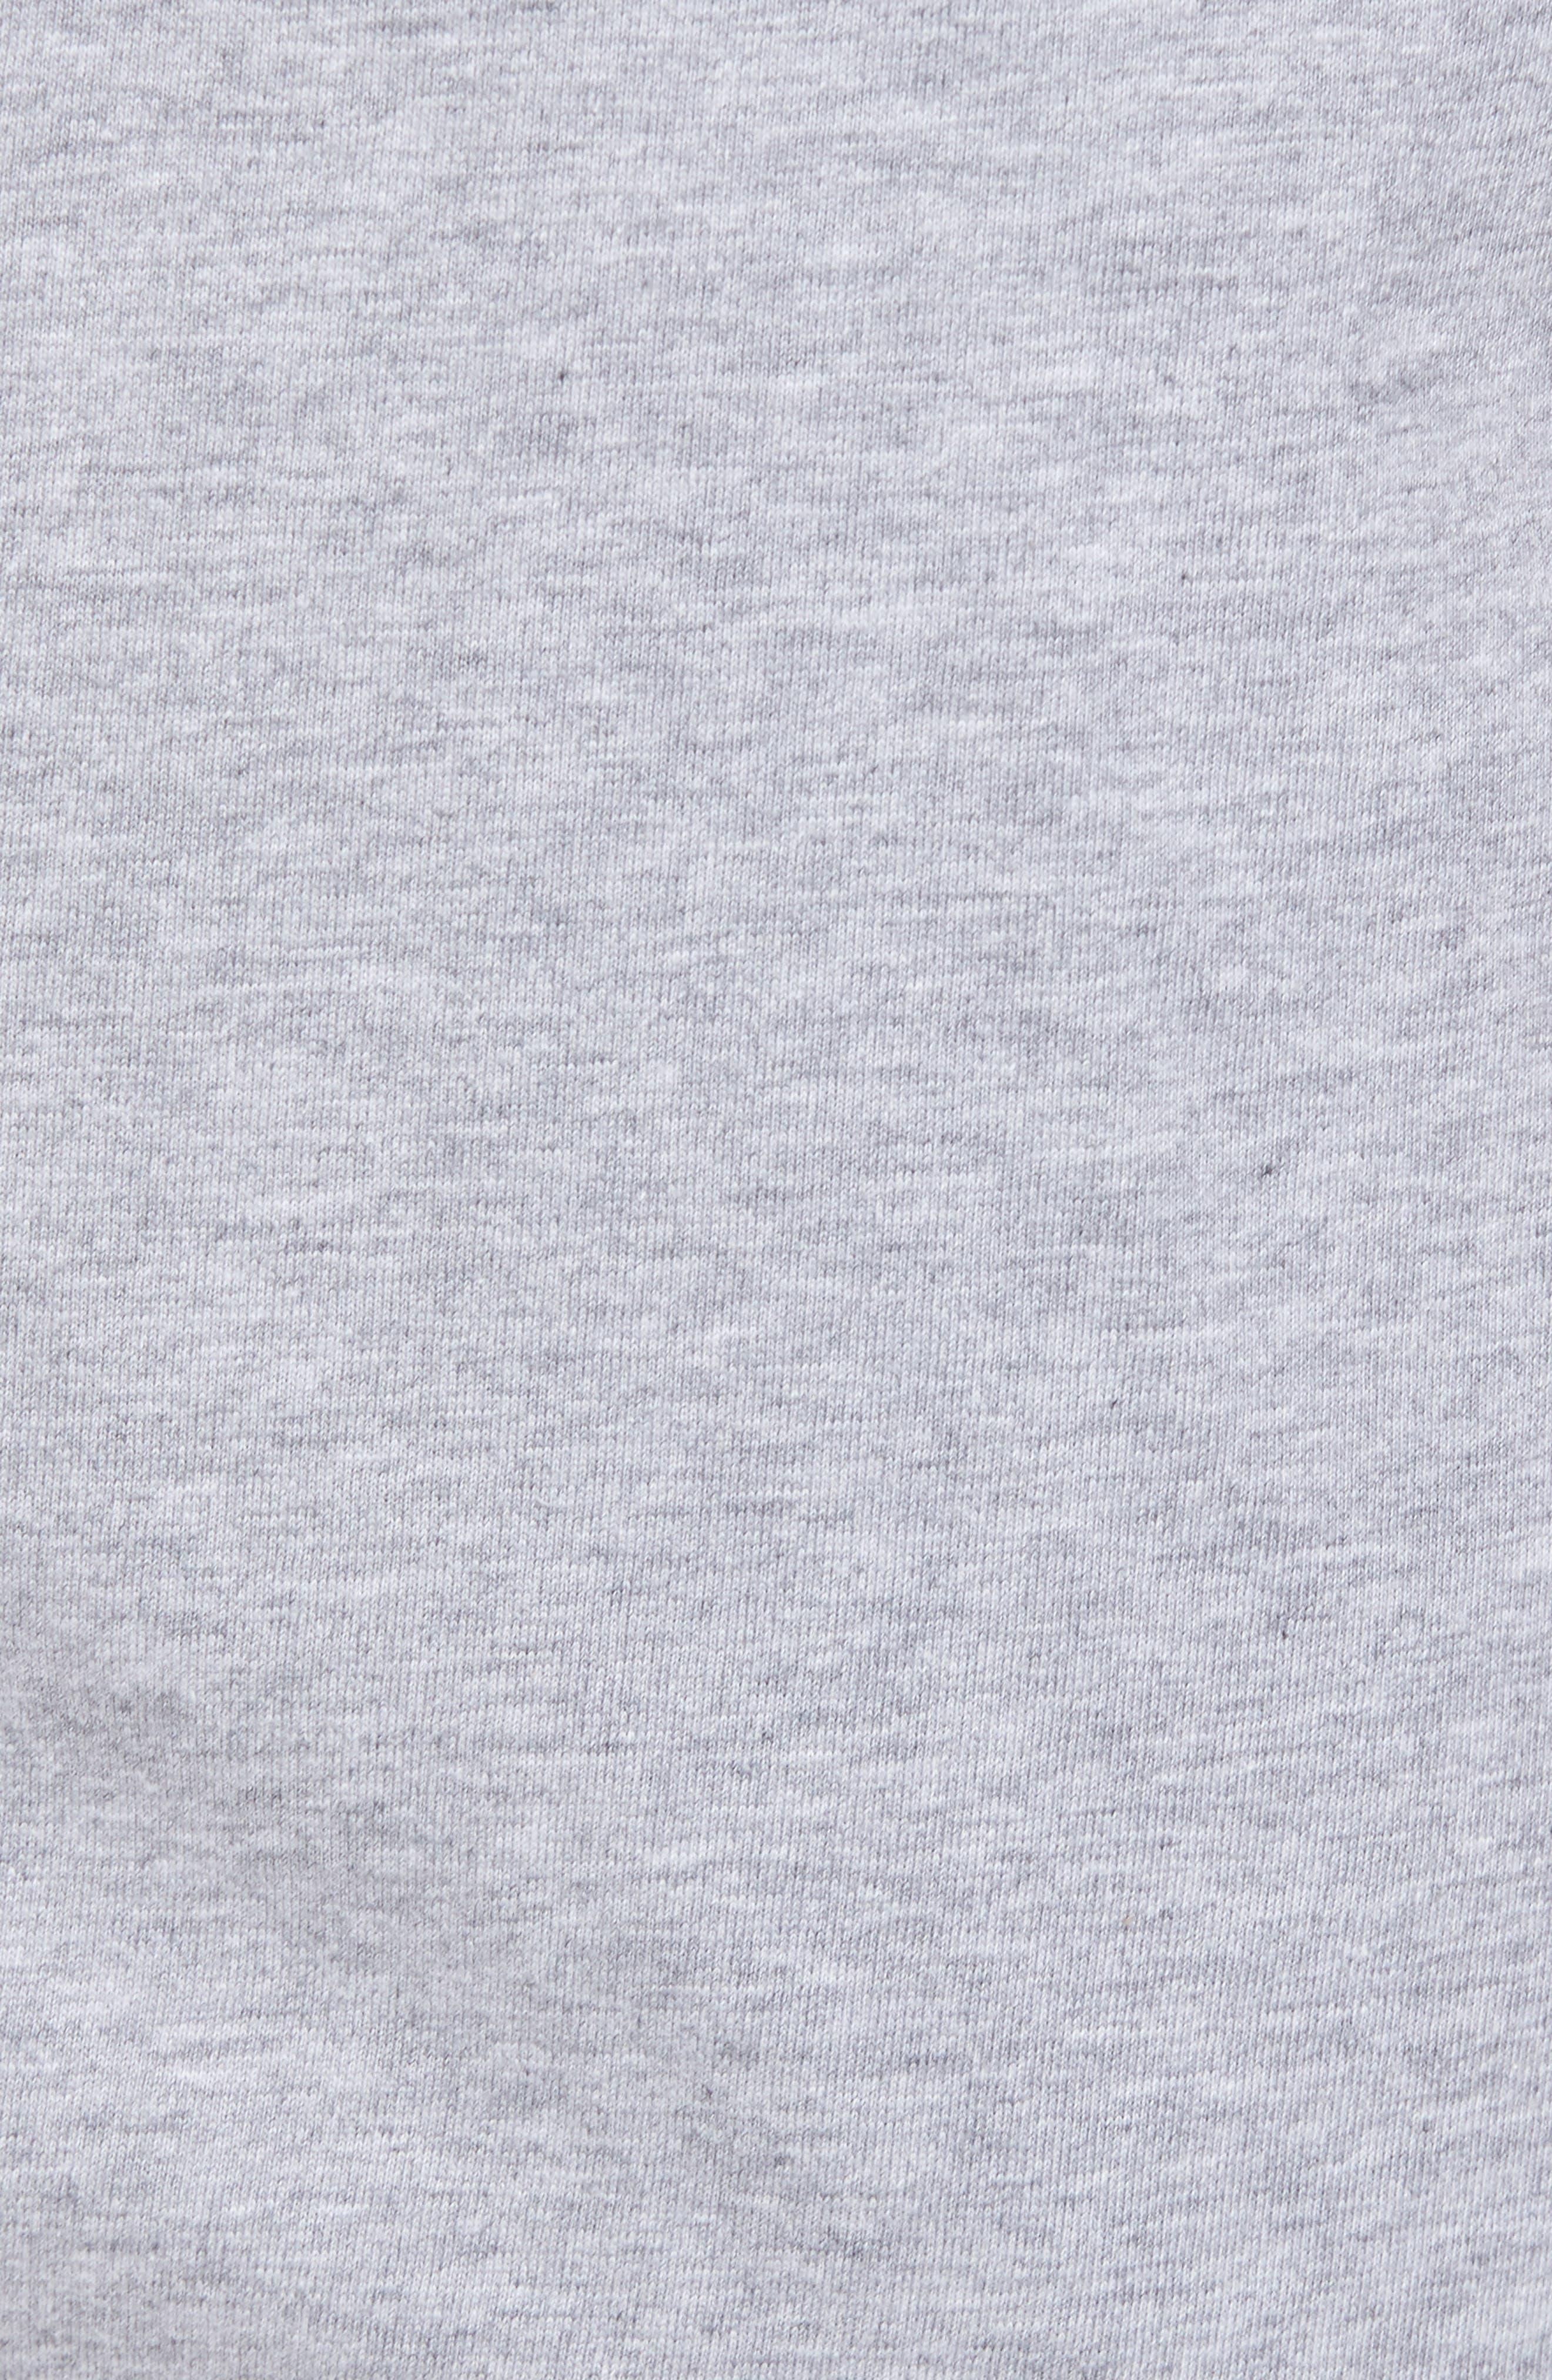 Night & Day Knit Shorts,                             Alternate thumbnail 5, color,                             SILVER MELANGE